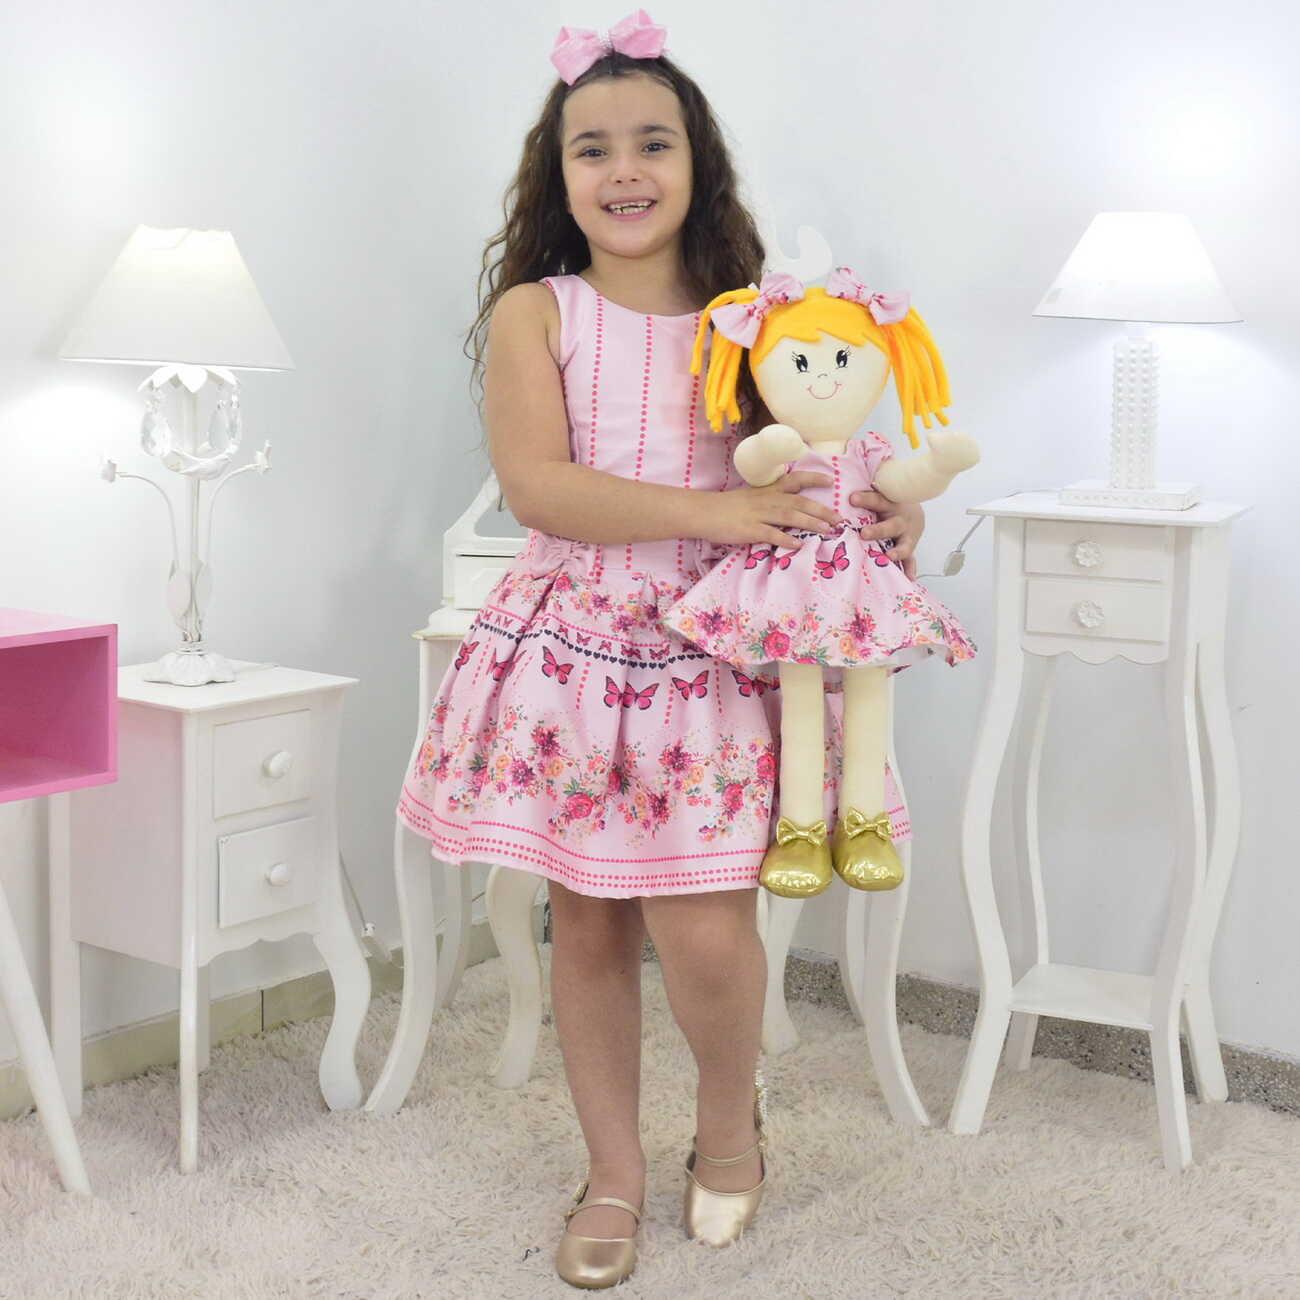 Tal Menina Tal Boneca Helo - Vestido Rosa Bebê Com Borboletas